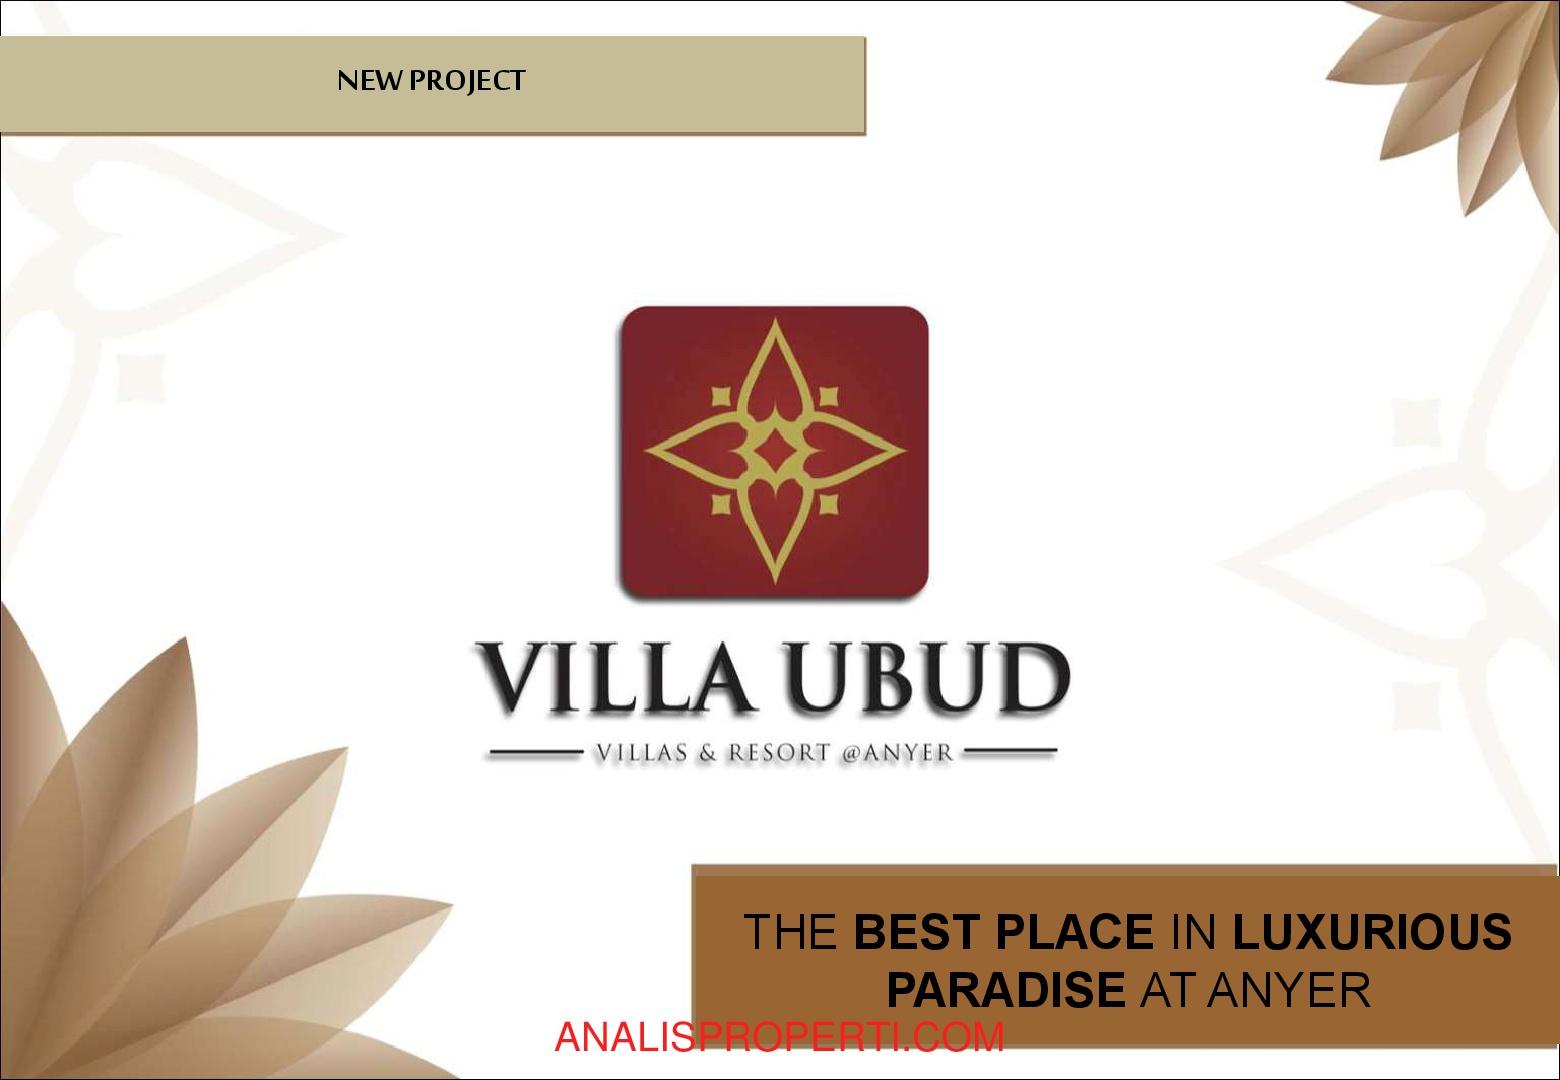 Villa Ubud Anyer Nuansa Resort Nusa Dua Bali Analis Properti